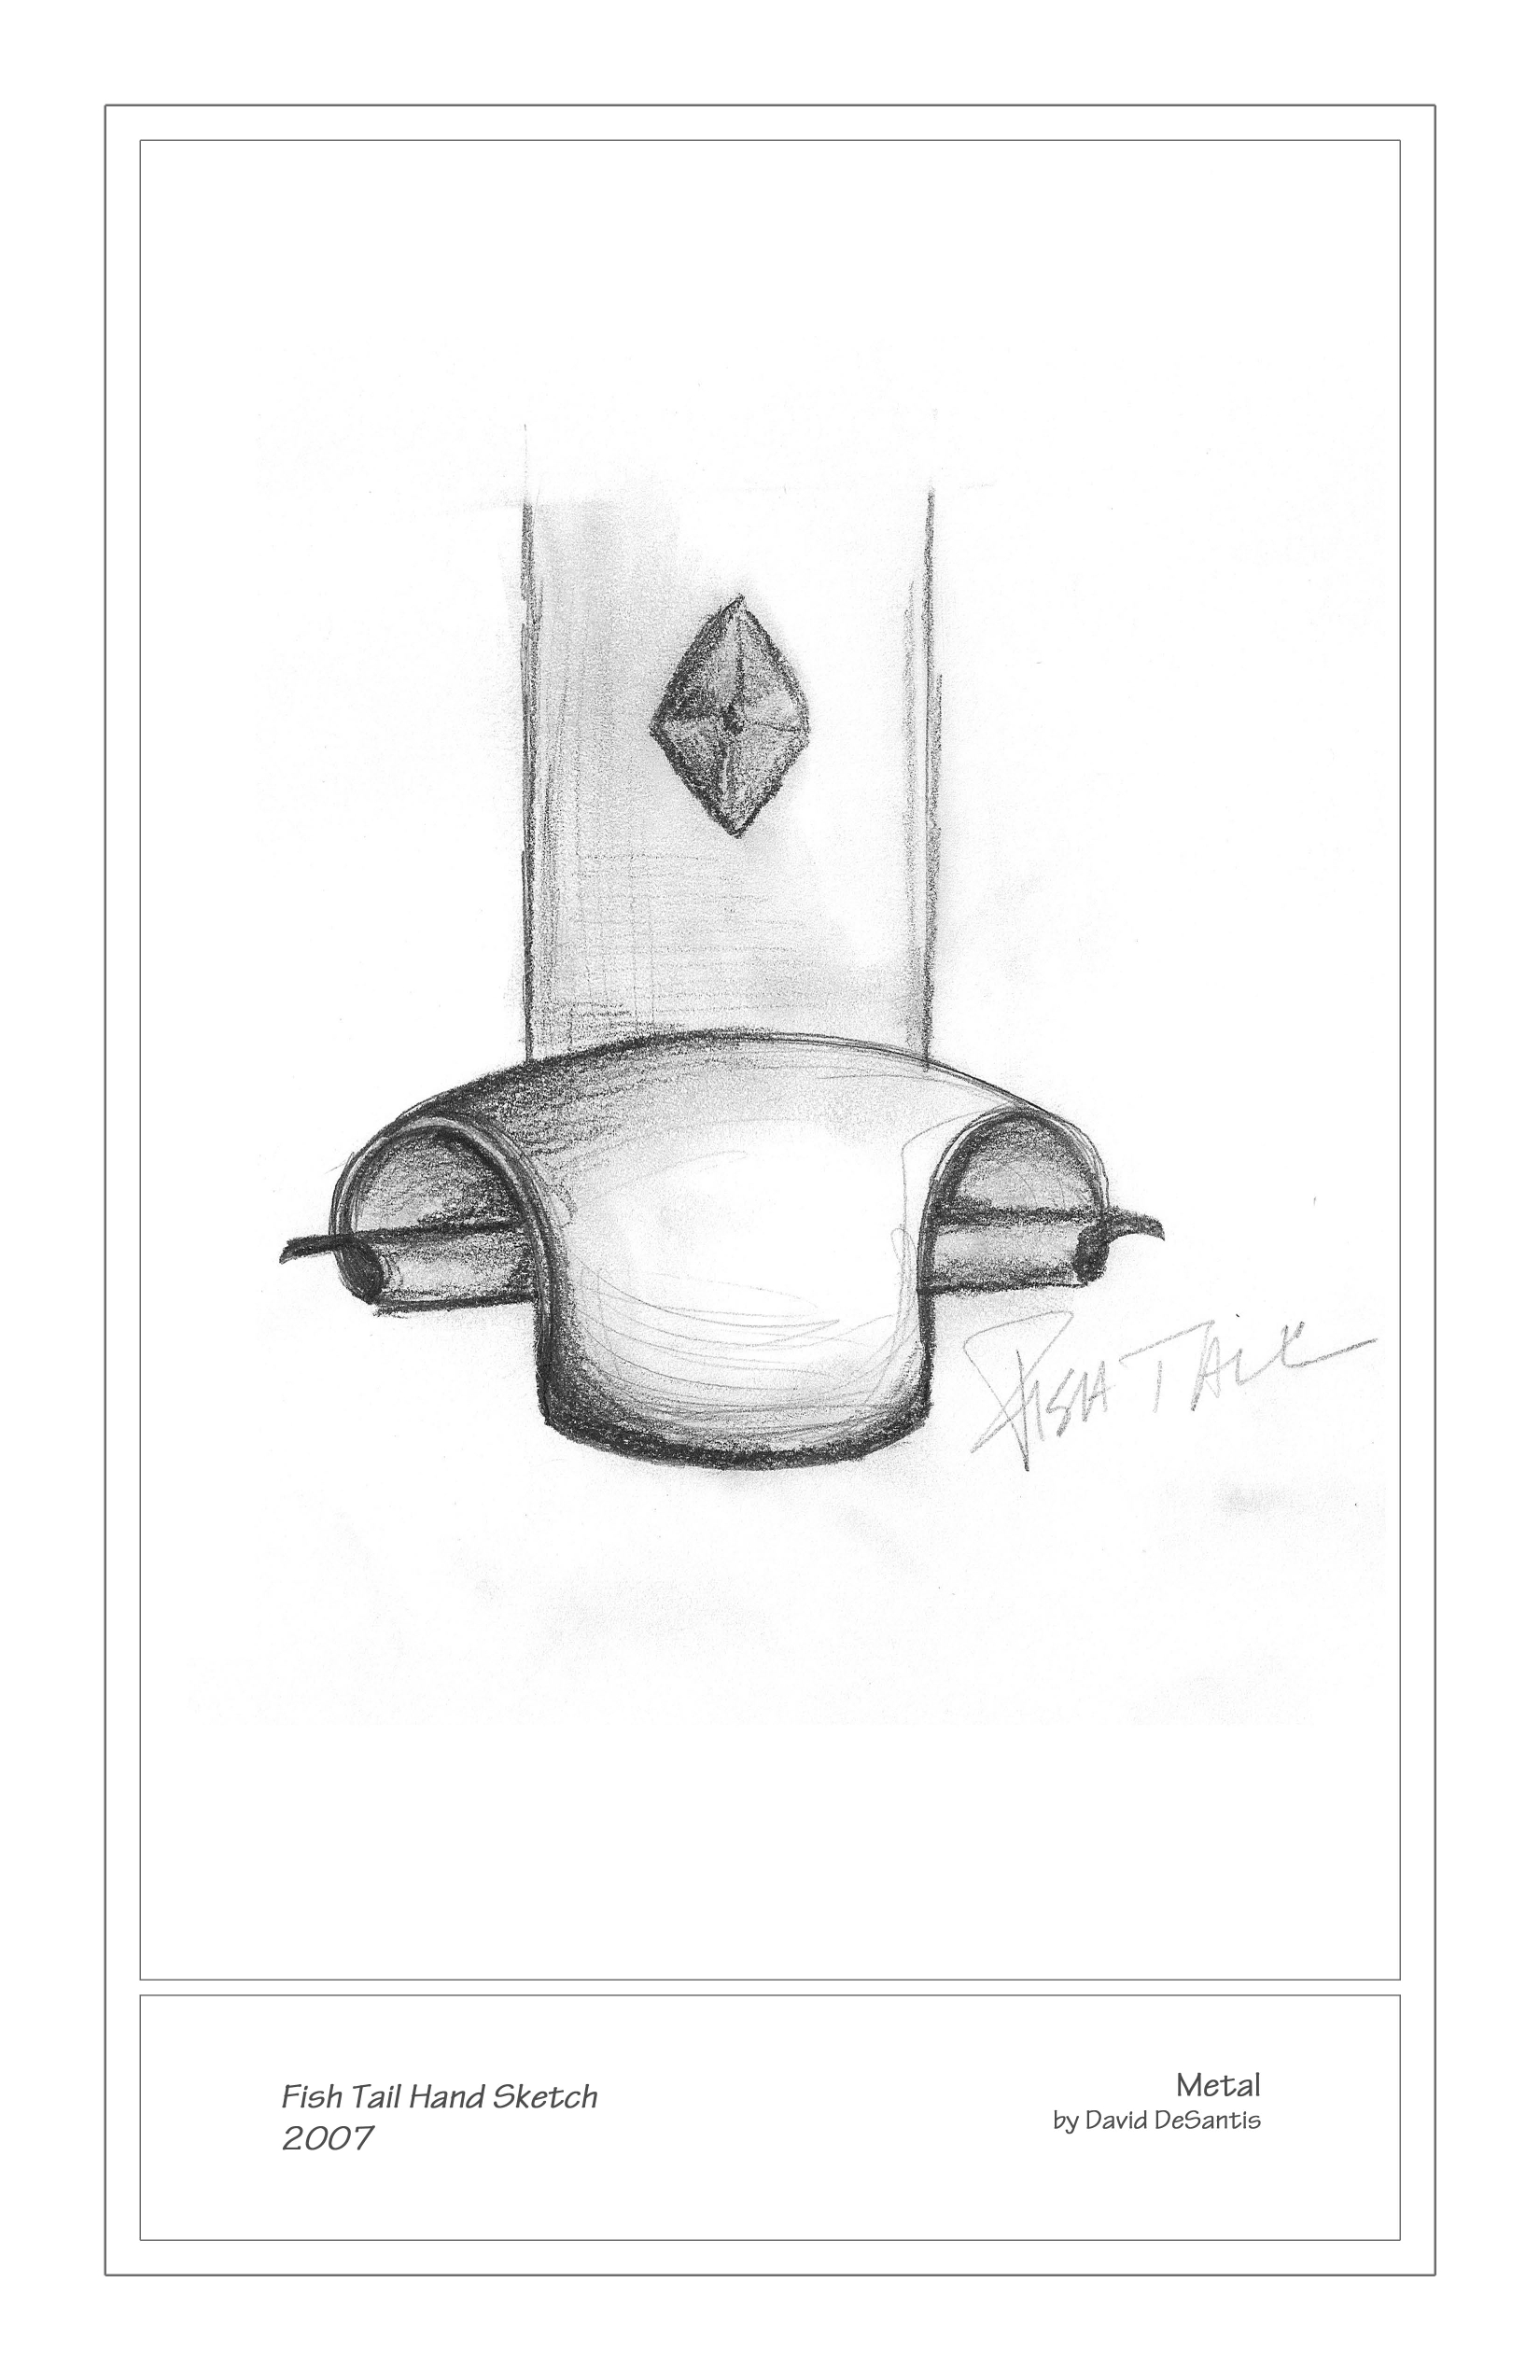 Fish Tail Sketch.jpg